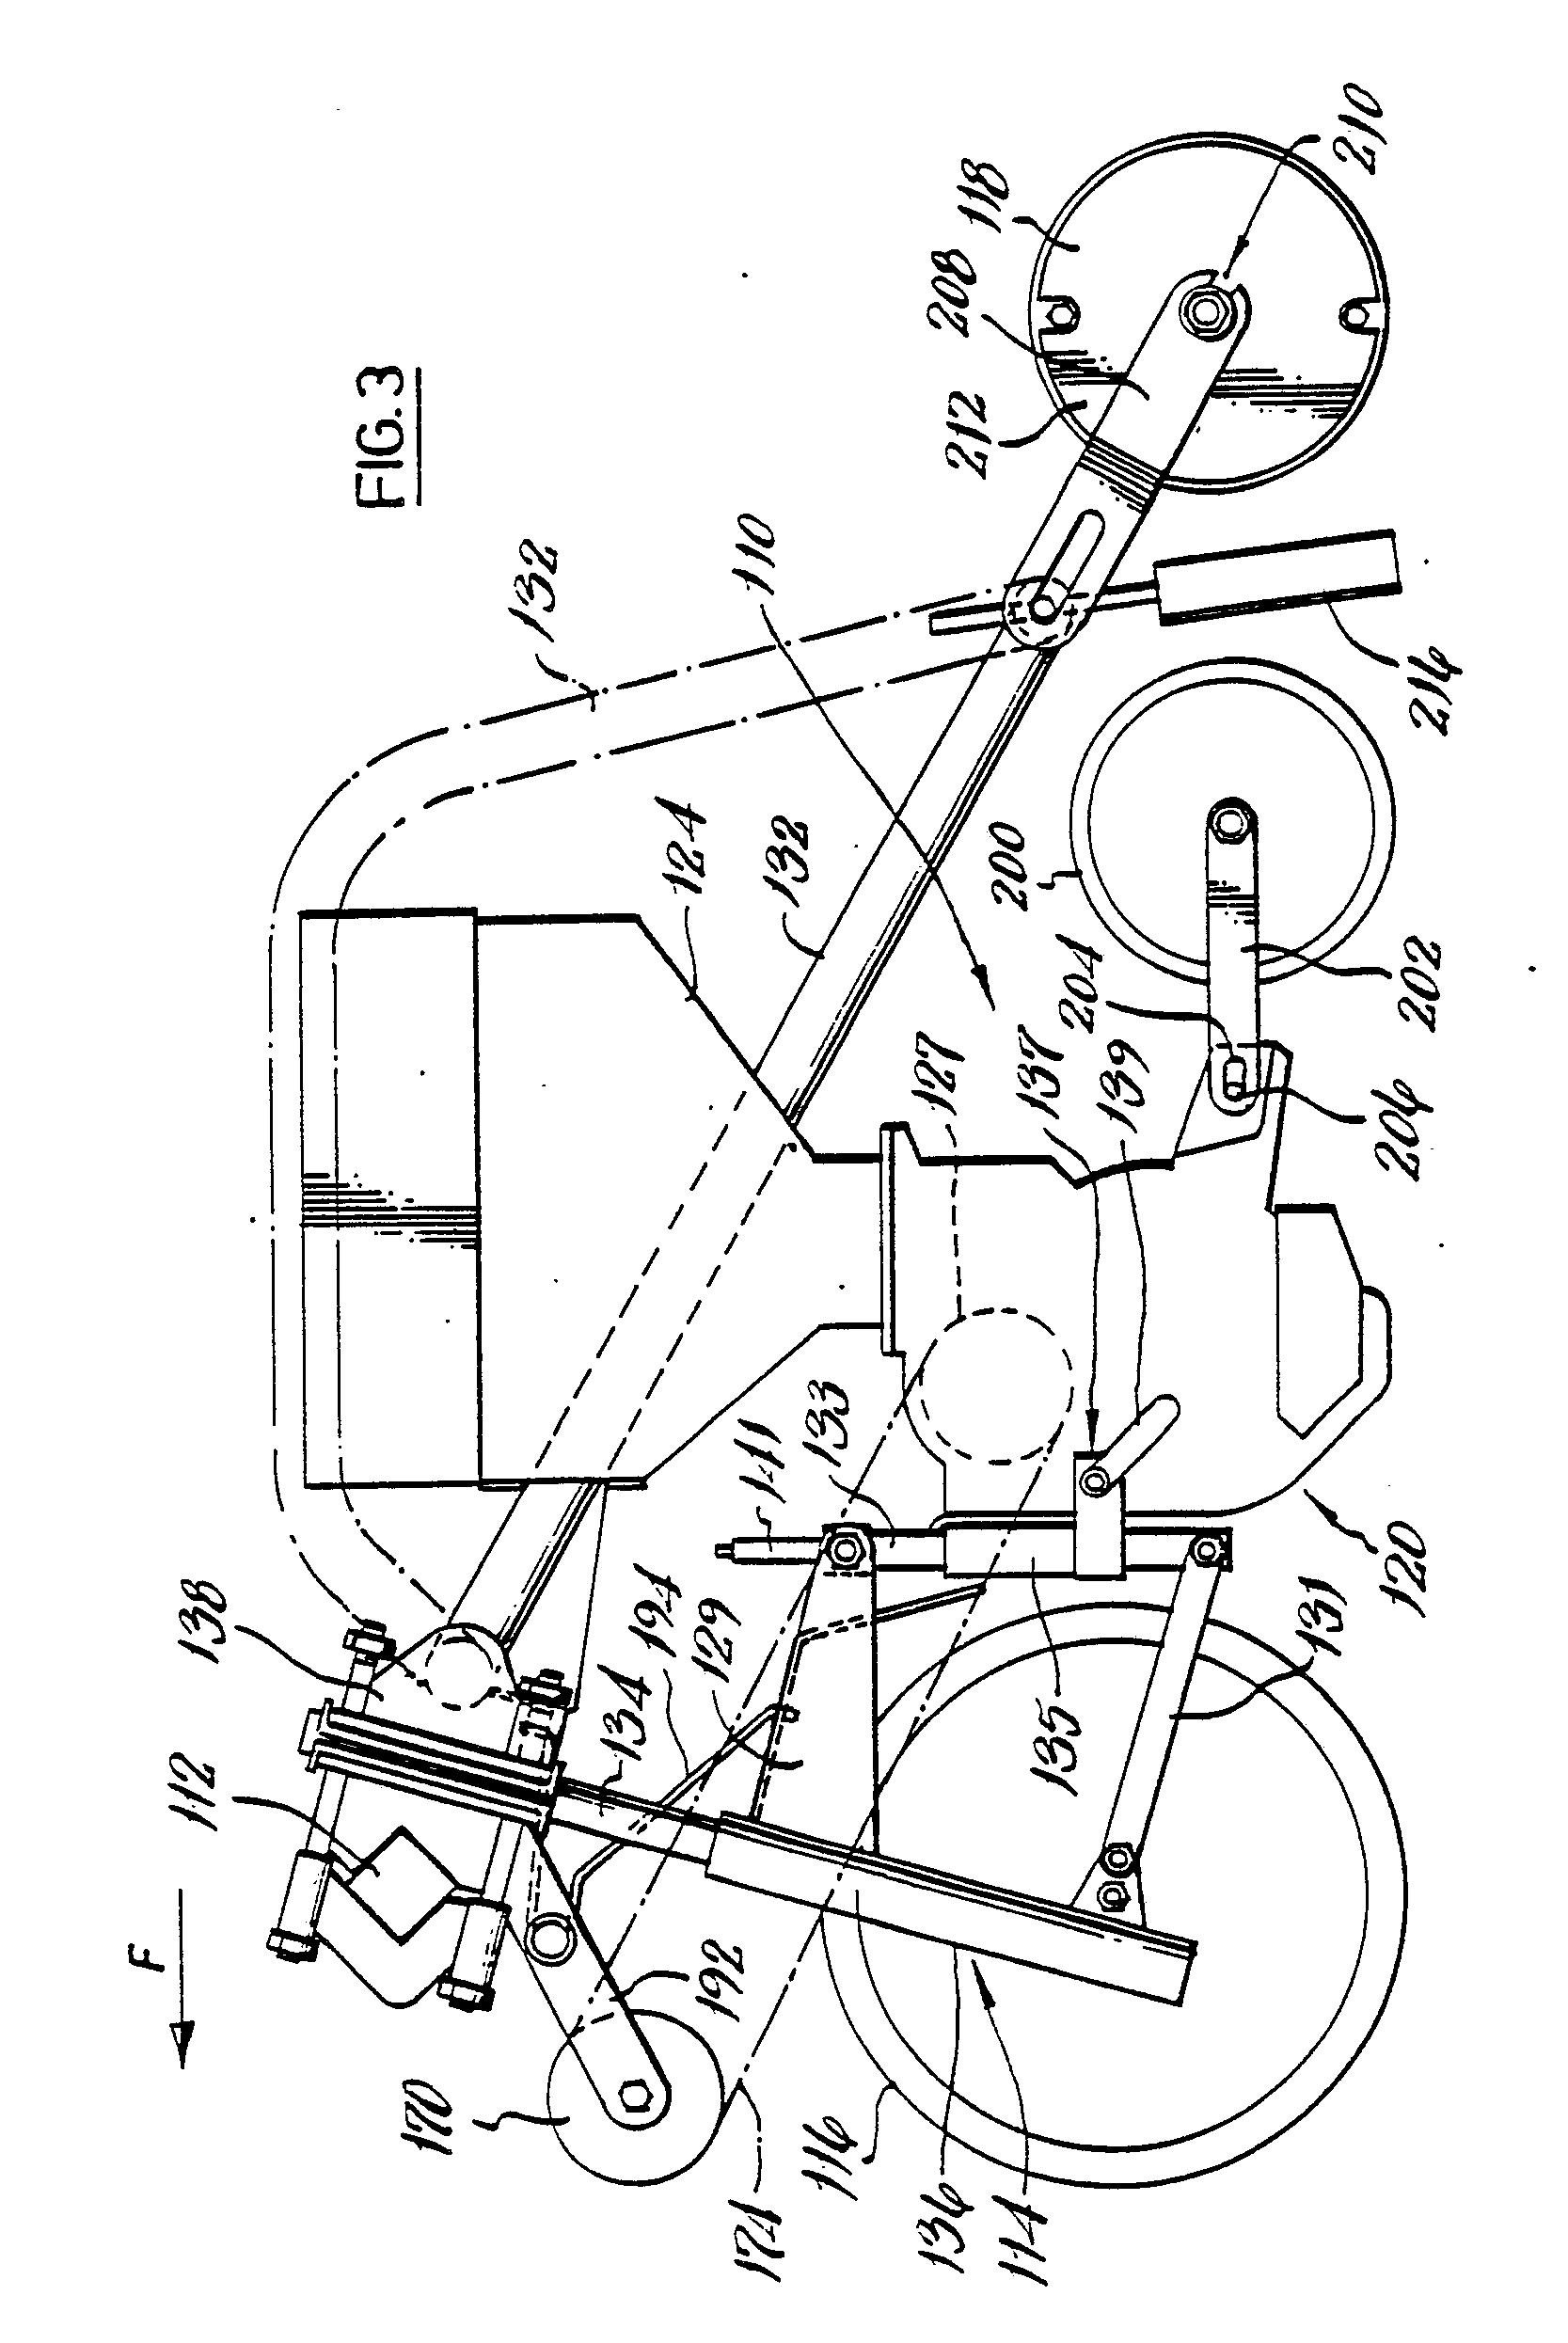 patent ep0195808b1